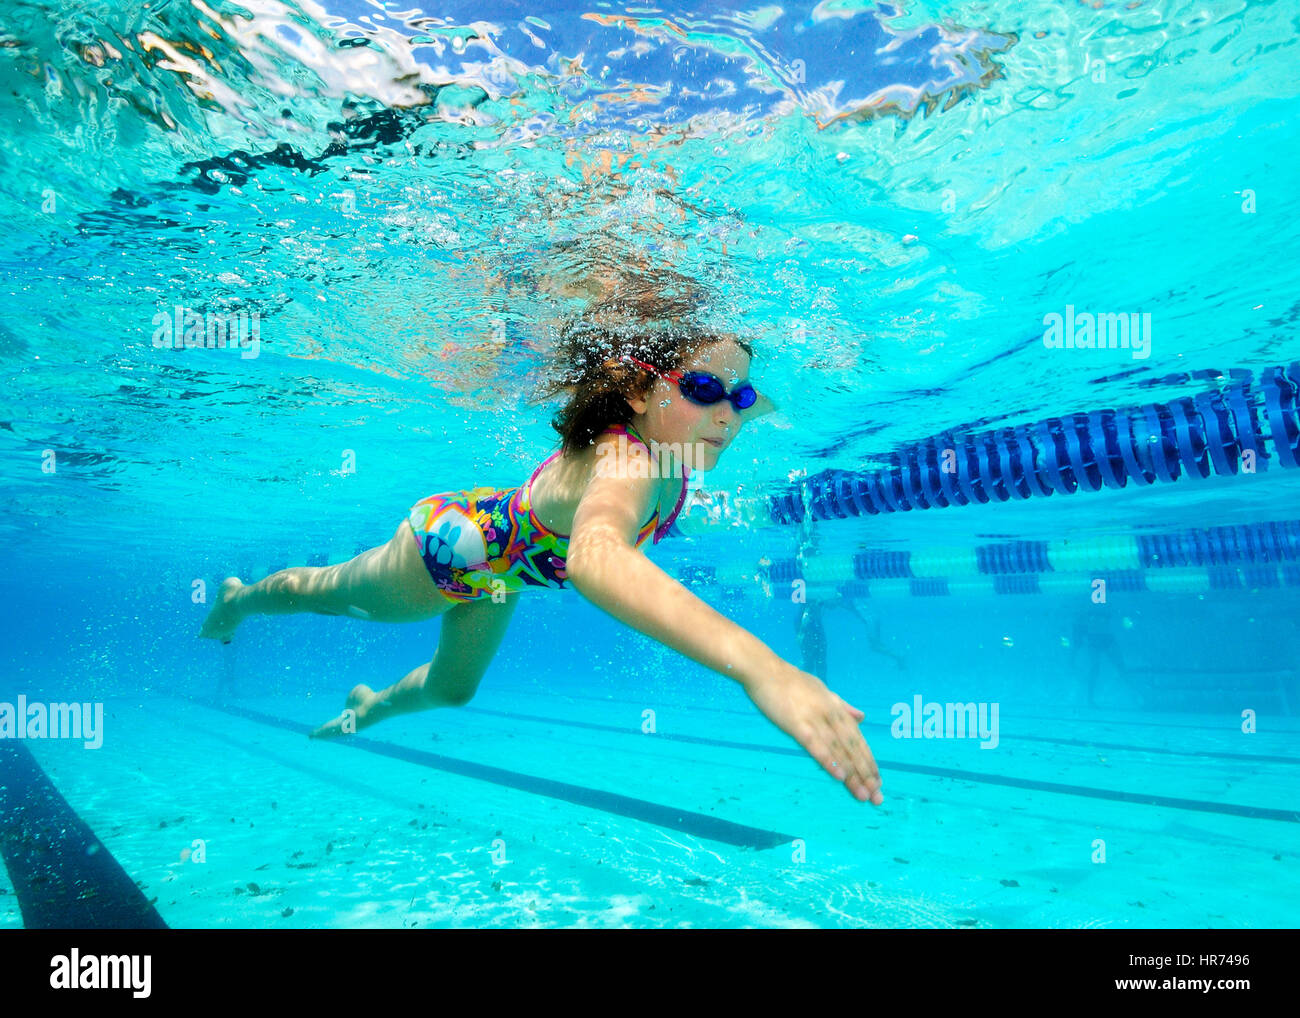 kids swimming underwater in pool enjoying the relaxation of summer - Kids Swimming Underwater